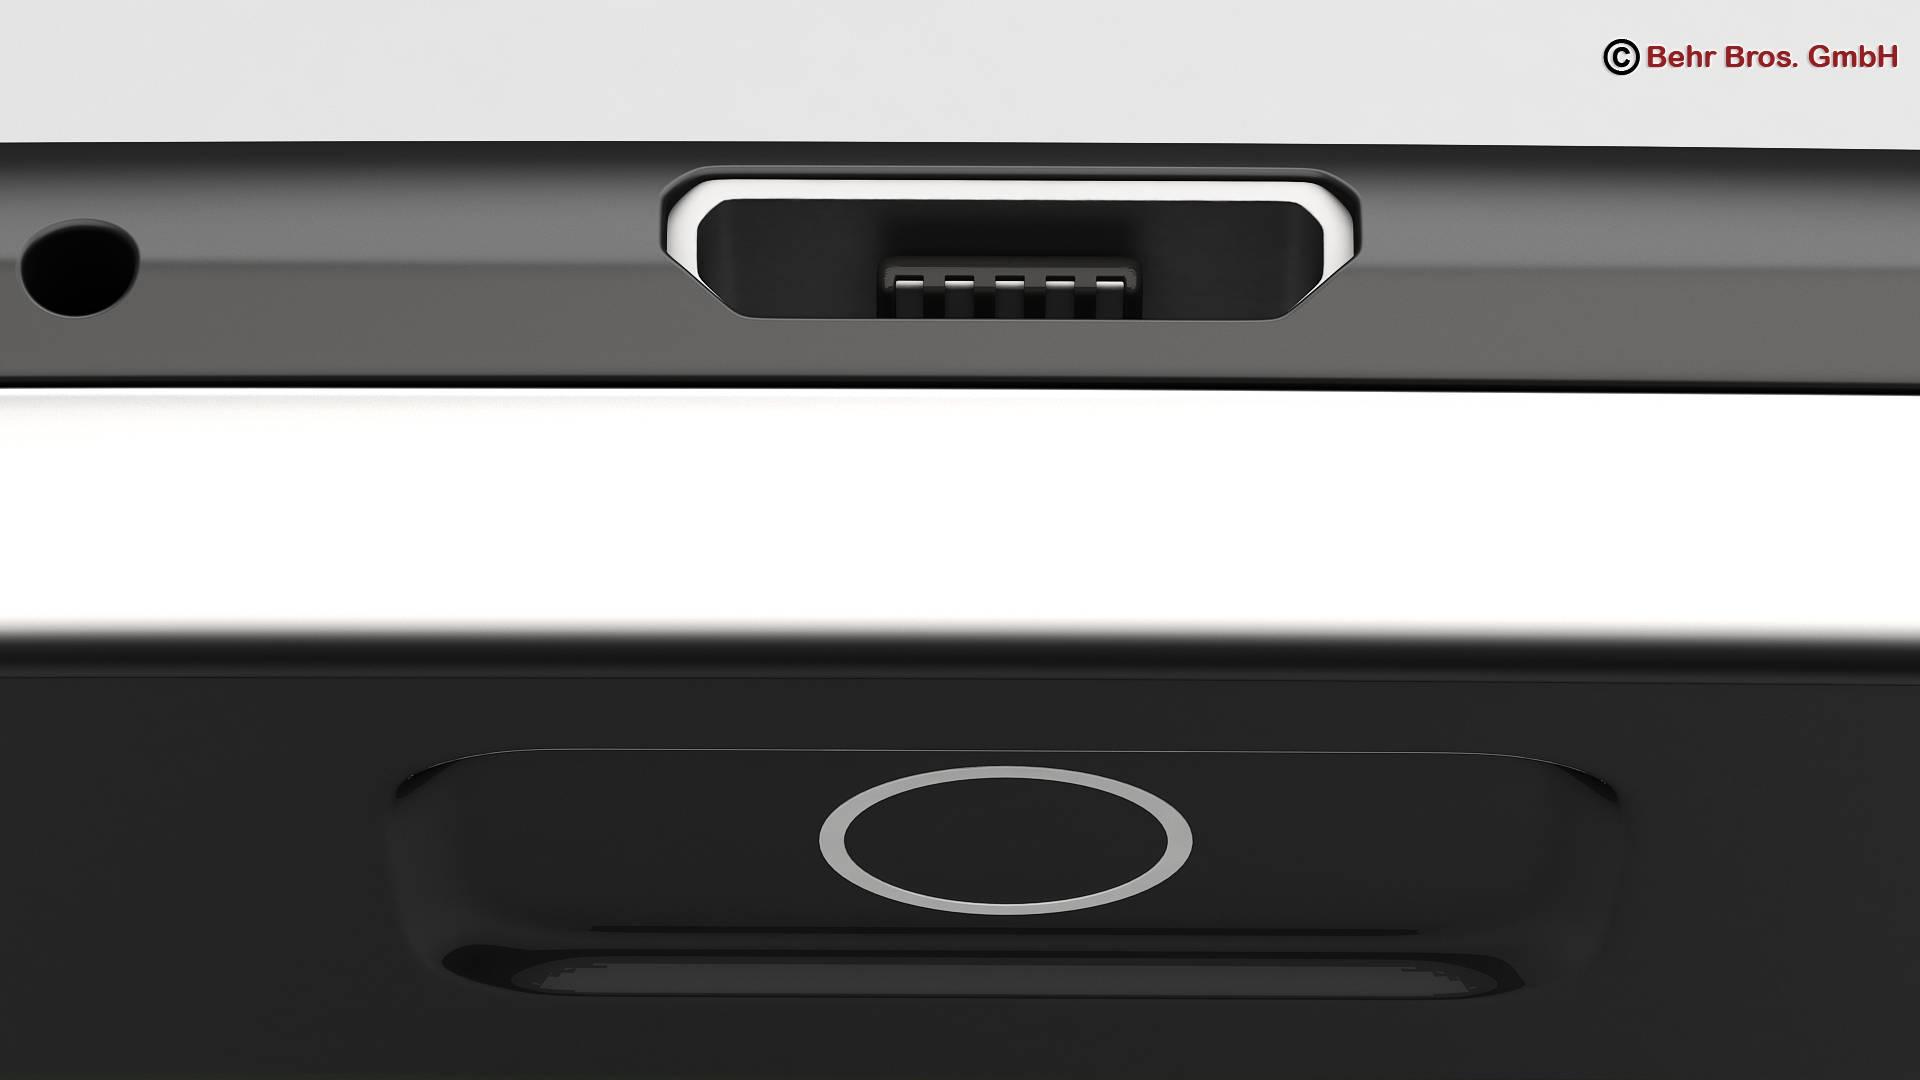 generic smartphone 5.2 inch 3d model 3ds max fbx c4d lwo ma mb obj 161653